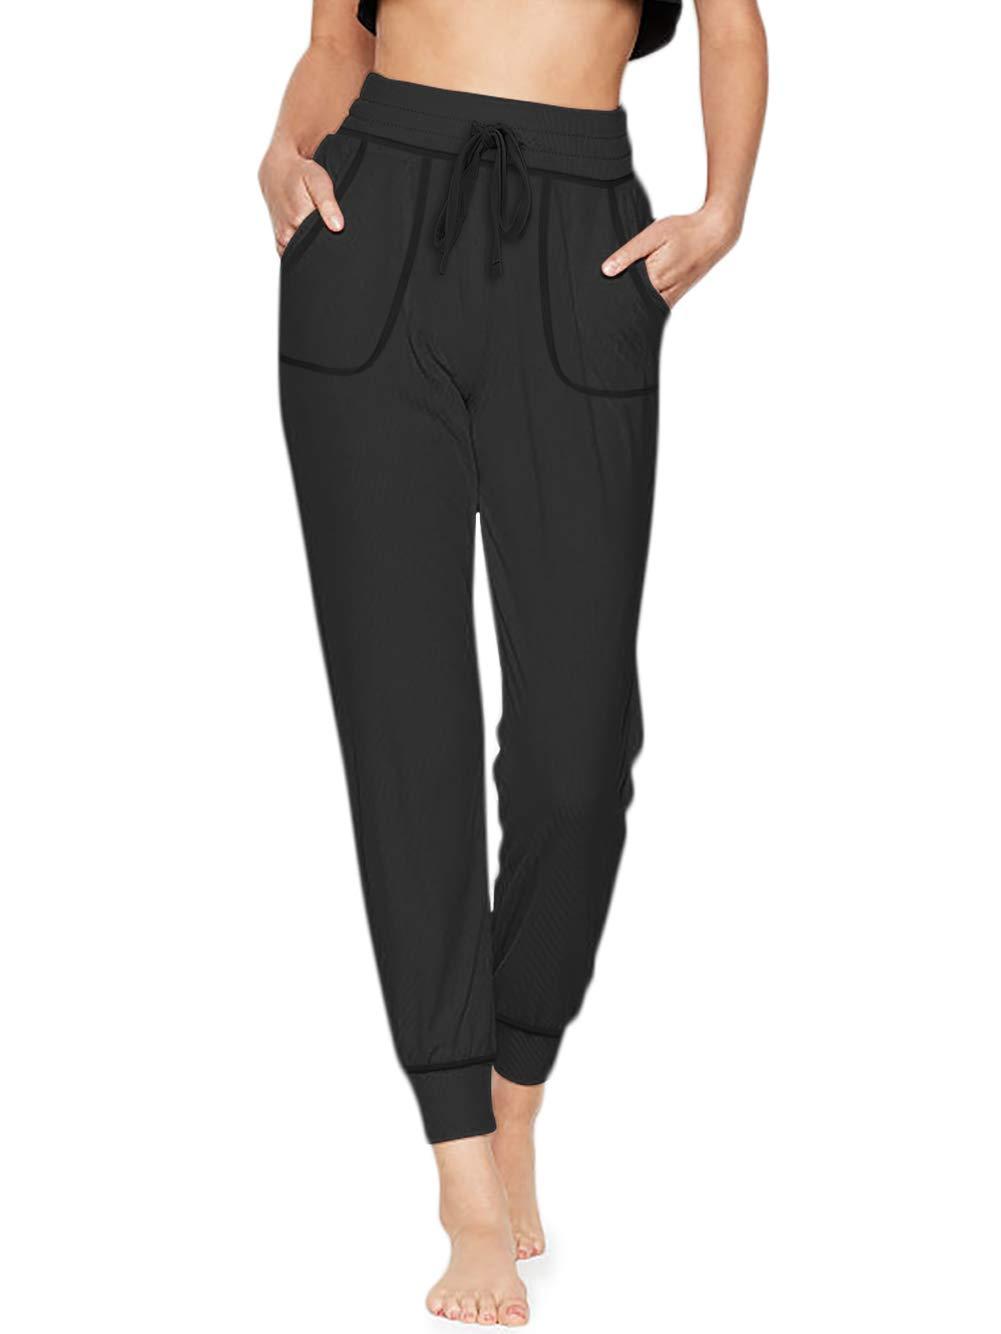 TAIPOVE Women's Jogger Pants with Pockets Drawstring Waist Lounge Sweatpants Active Yoga Sweat Pants